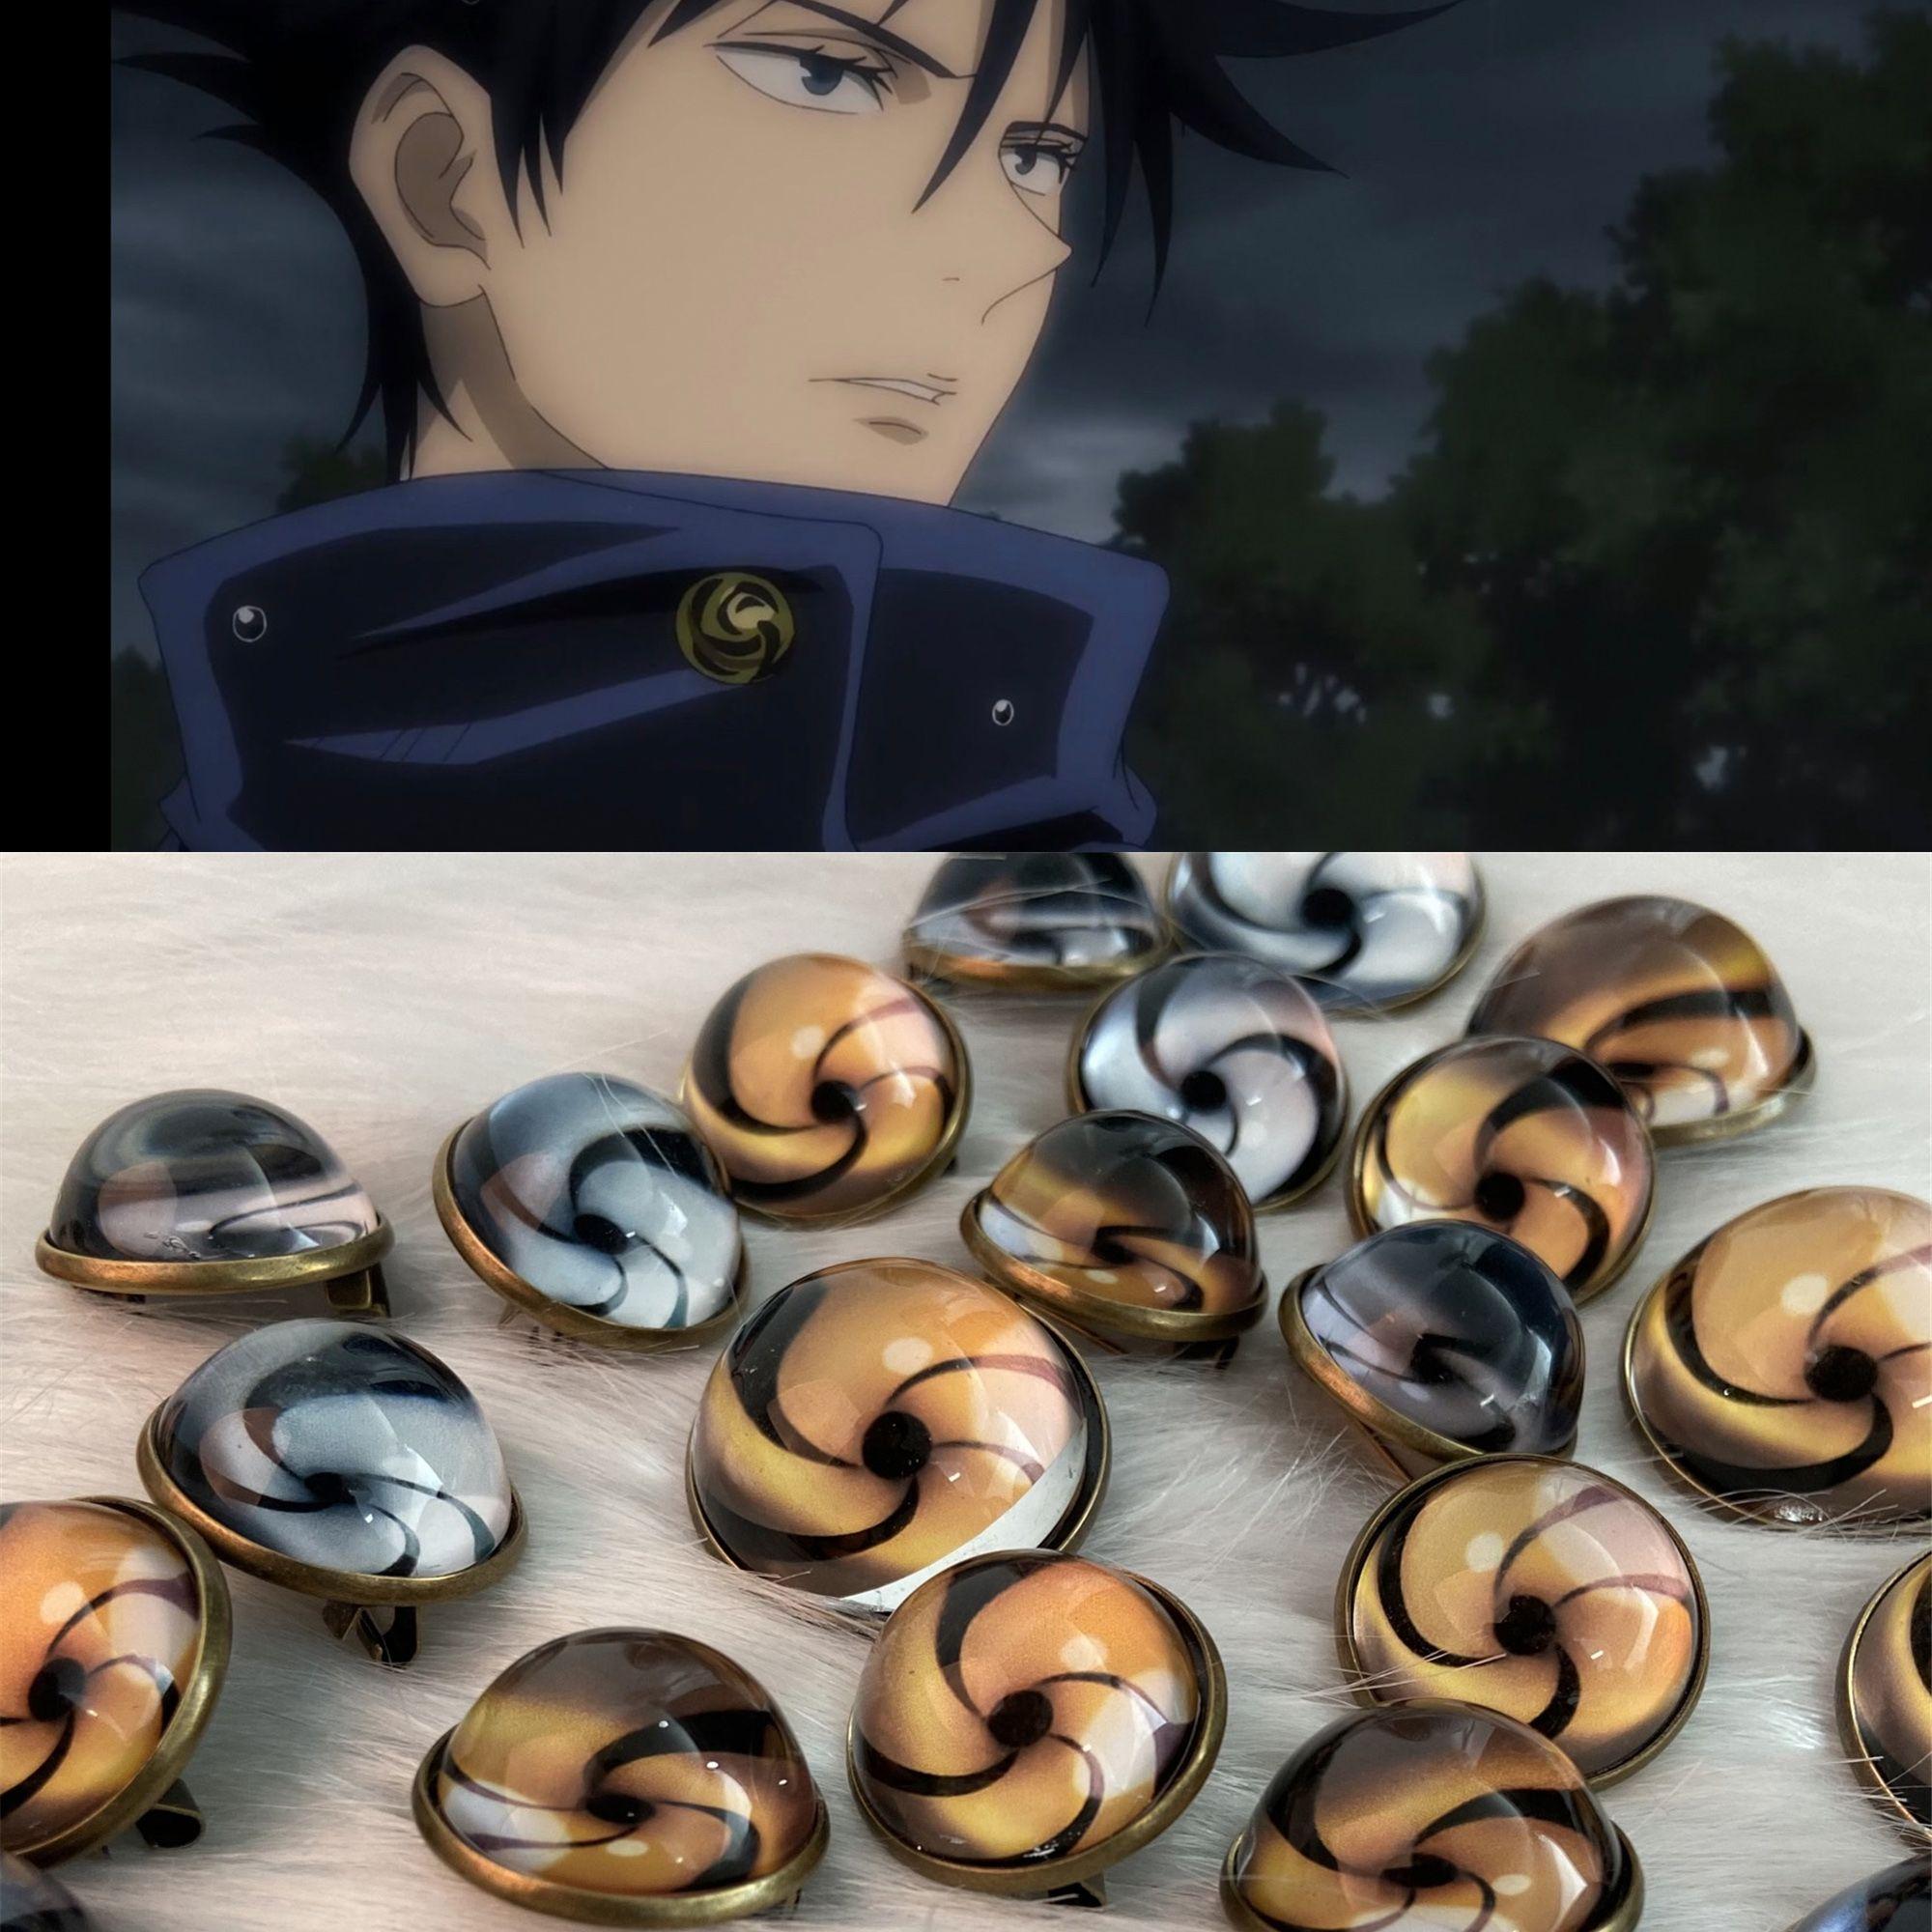 Anime Jujutsu Kaisen School Uniform Button Badge Cosplay Etsy In 2021 Jujutsu Anime School Uniform